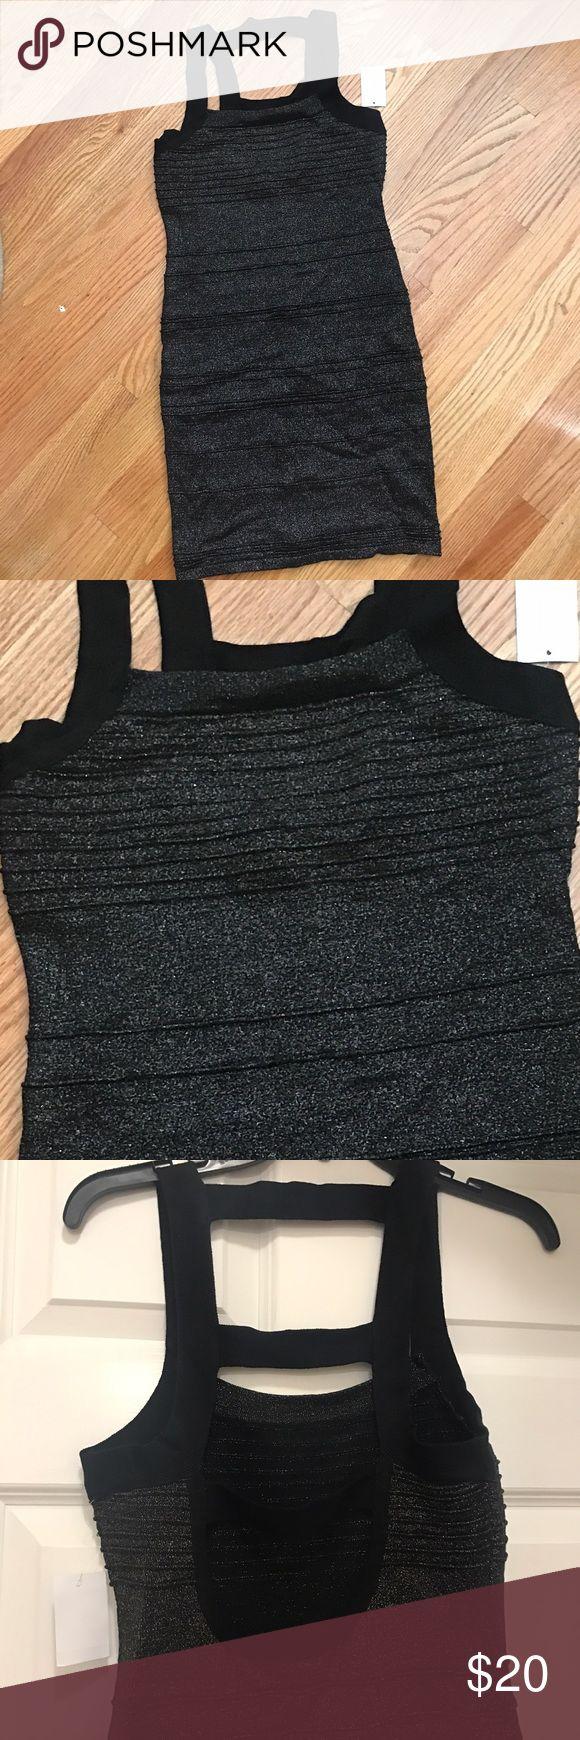 Sparkly Bandage Dress Charlotte Russe NWT Sparkly Bandage Dress Charlotte Rouse NWT Charlotte Russe Dresses